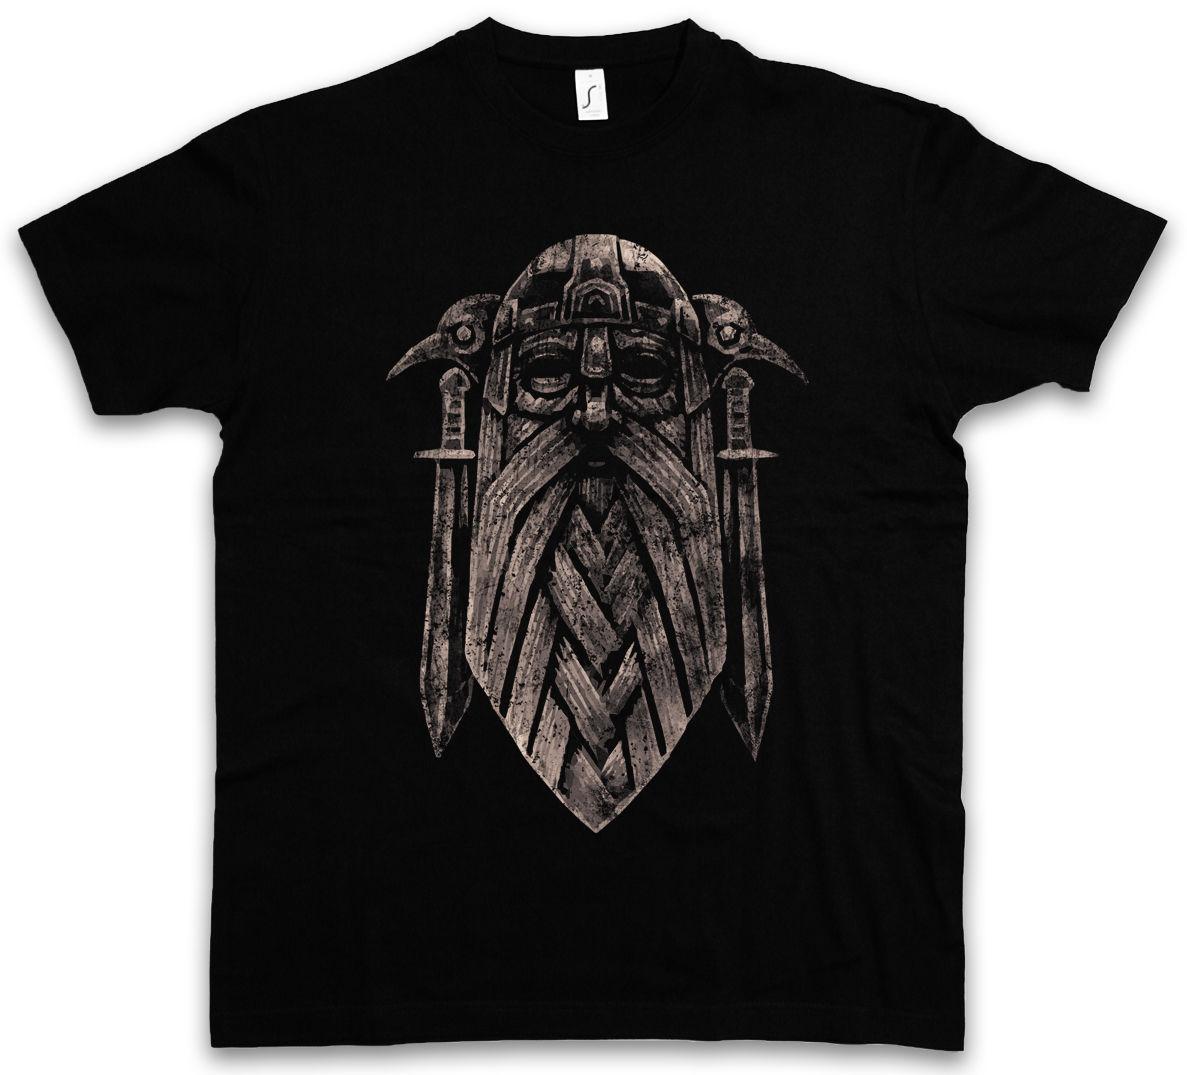 ODHIN IX T-SHIRT Valhalla Norse Vikings Odhin Odin Thor German Norse God 100% Cotton Short Sleeve Summer T-Shirt